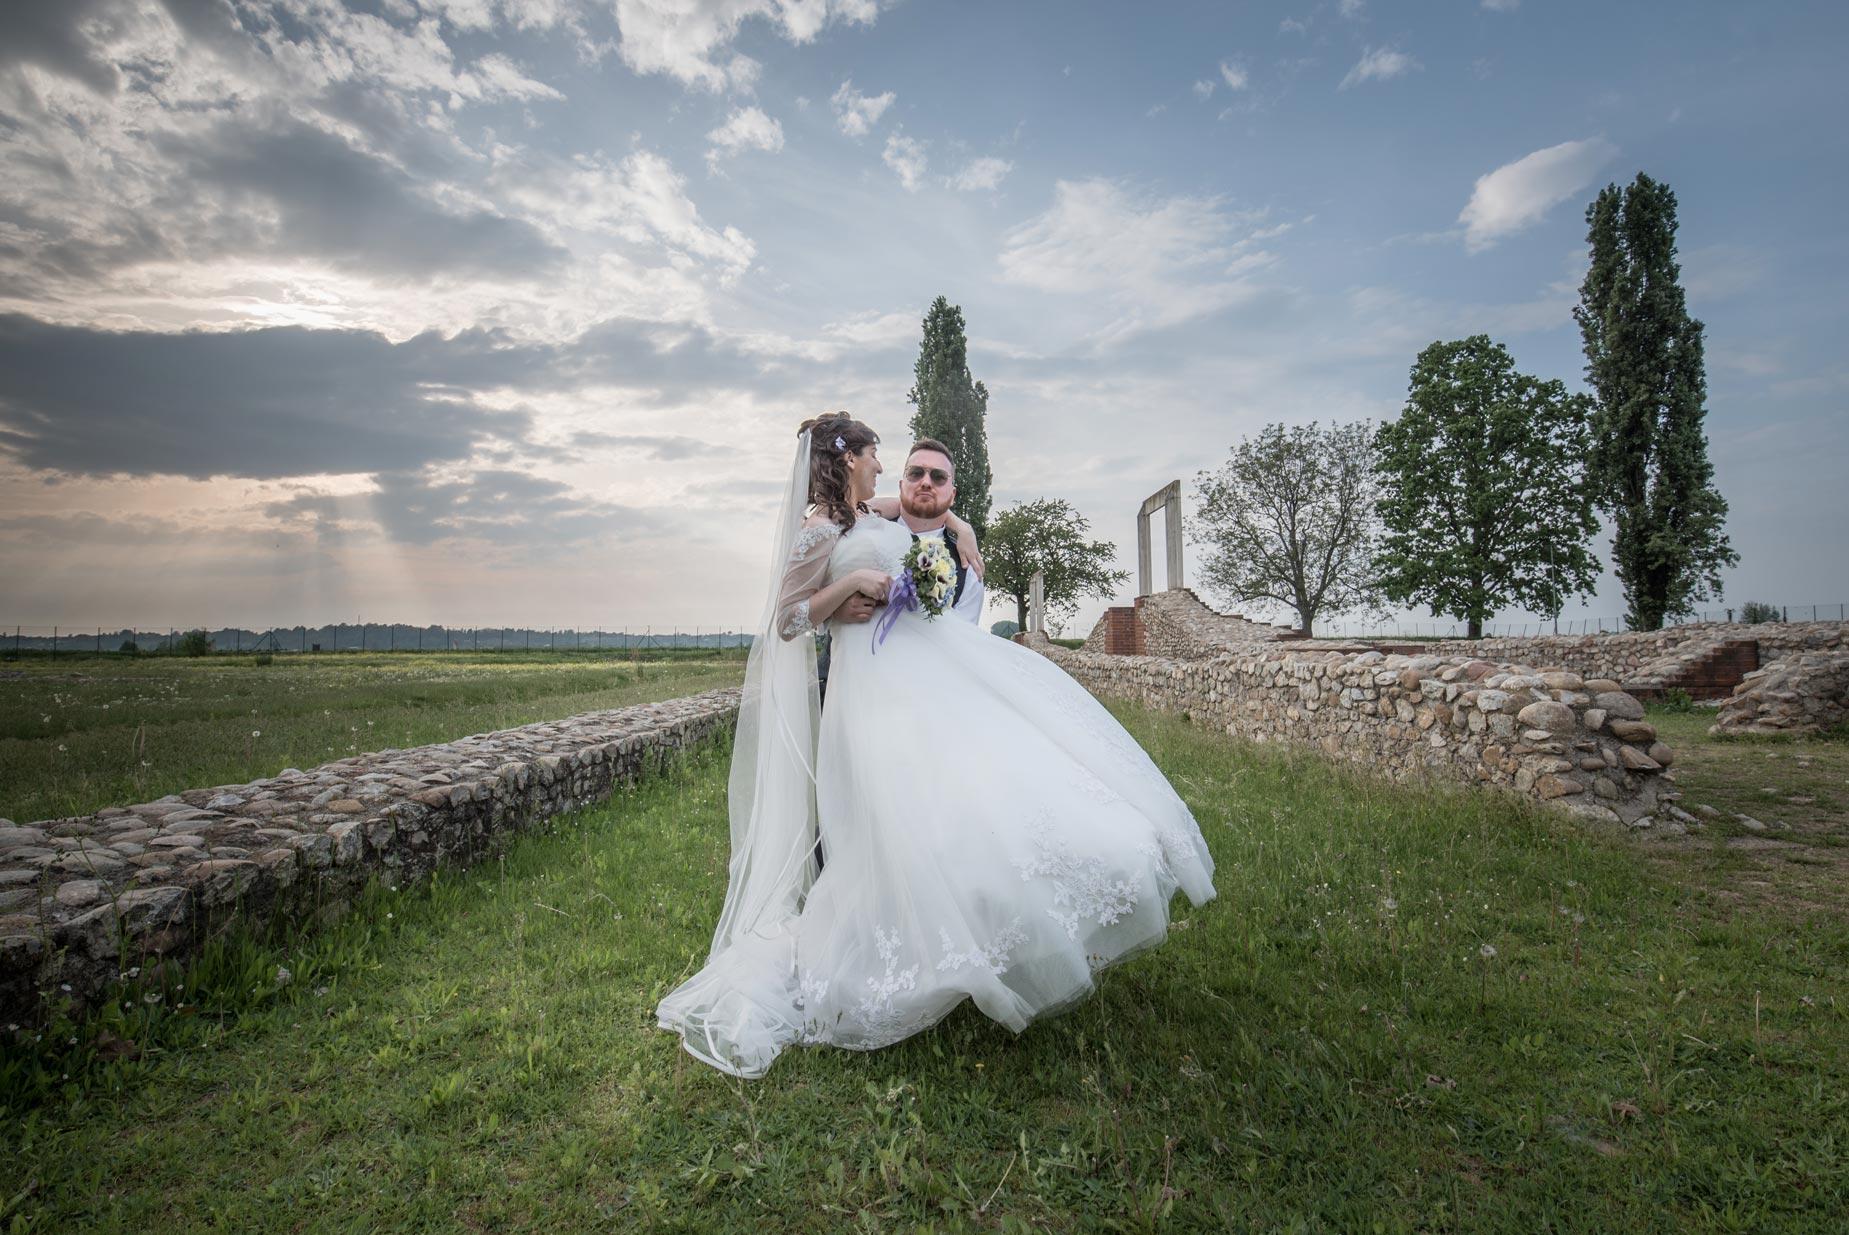 Matrimonio a Narzole Lorenza Diego - DSC 0693 - Fotografo Matrimonio nel Roero - Fotografo Matrimonio nel Roero